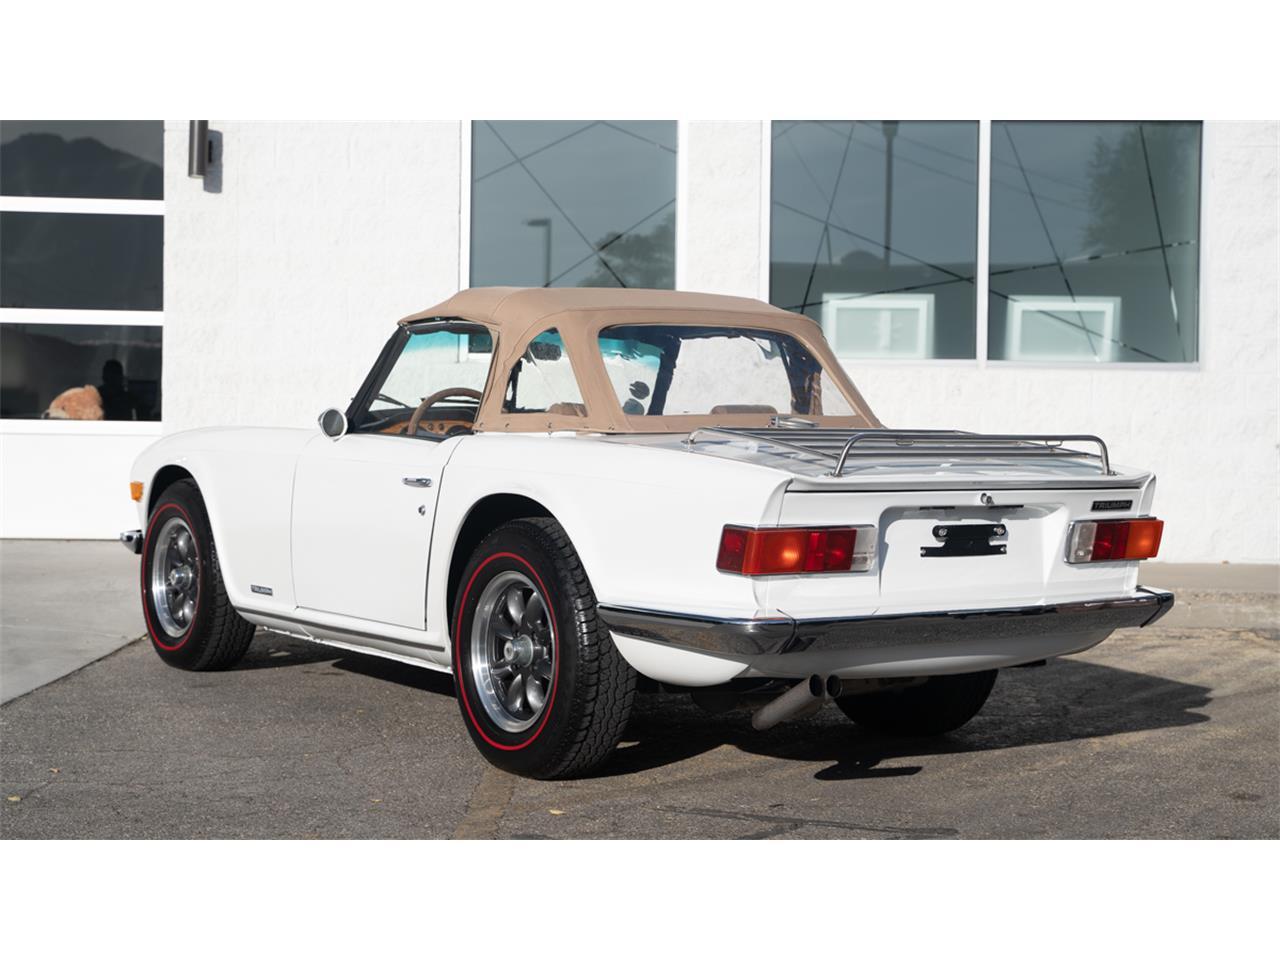 1973 Triumph TR6 (CC-1410370) for sale in Salt Lake City, Utah